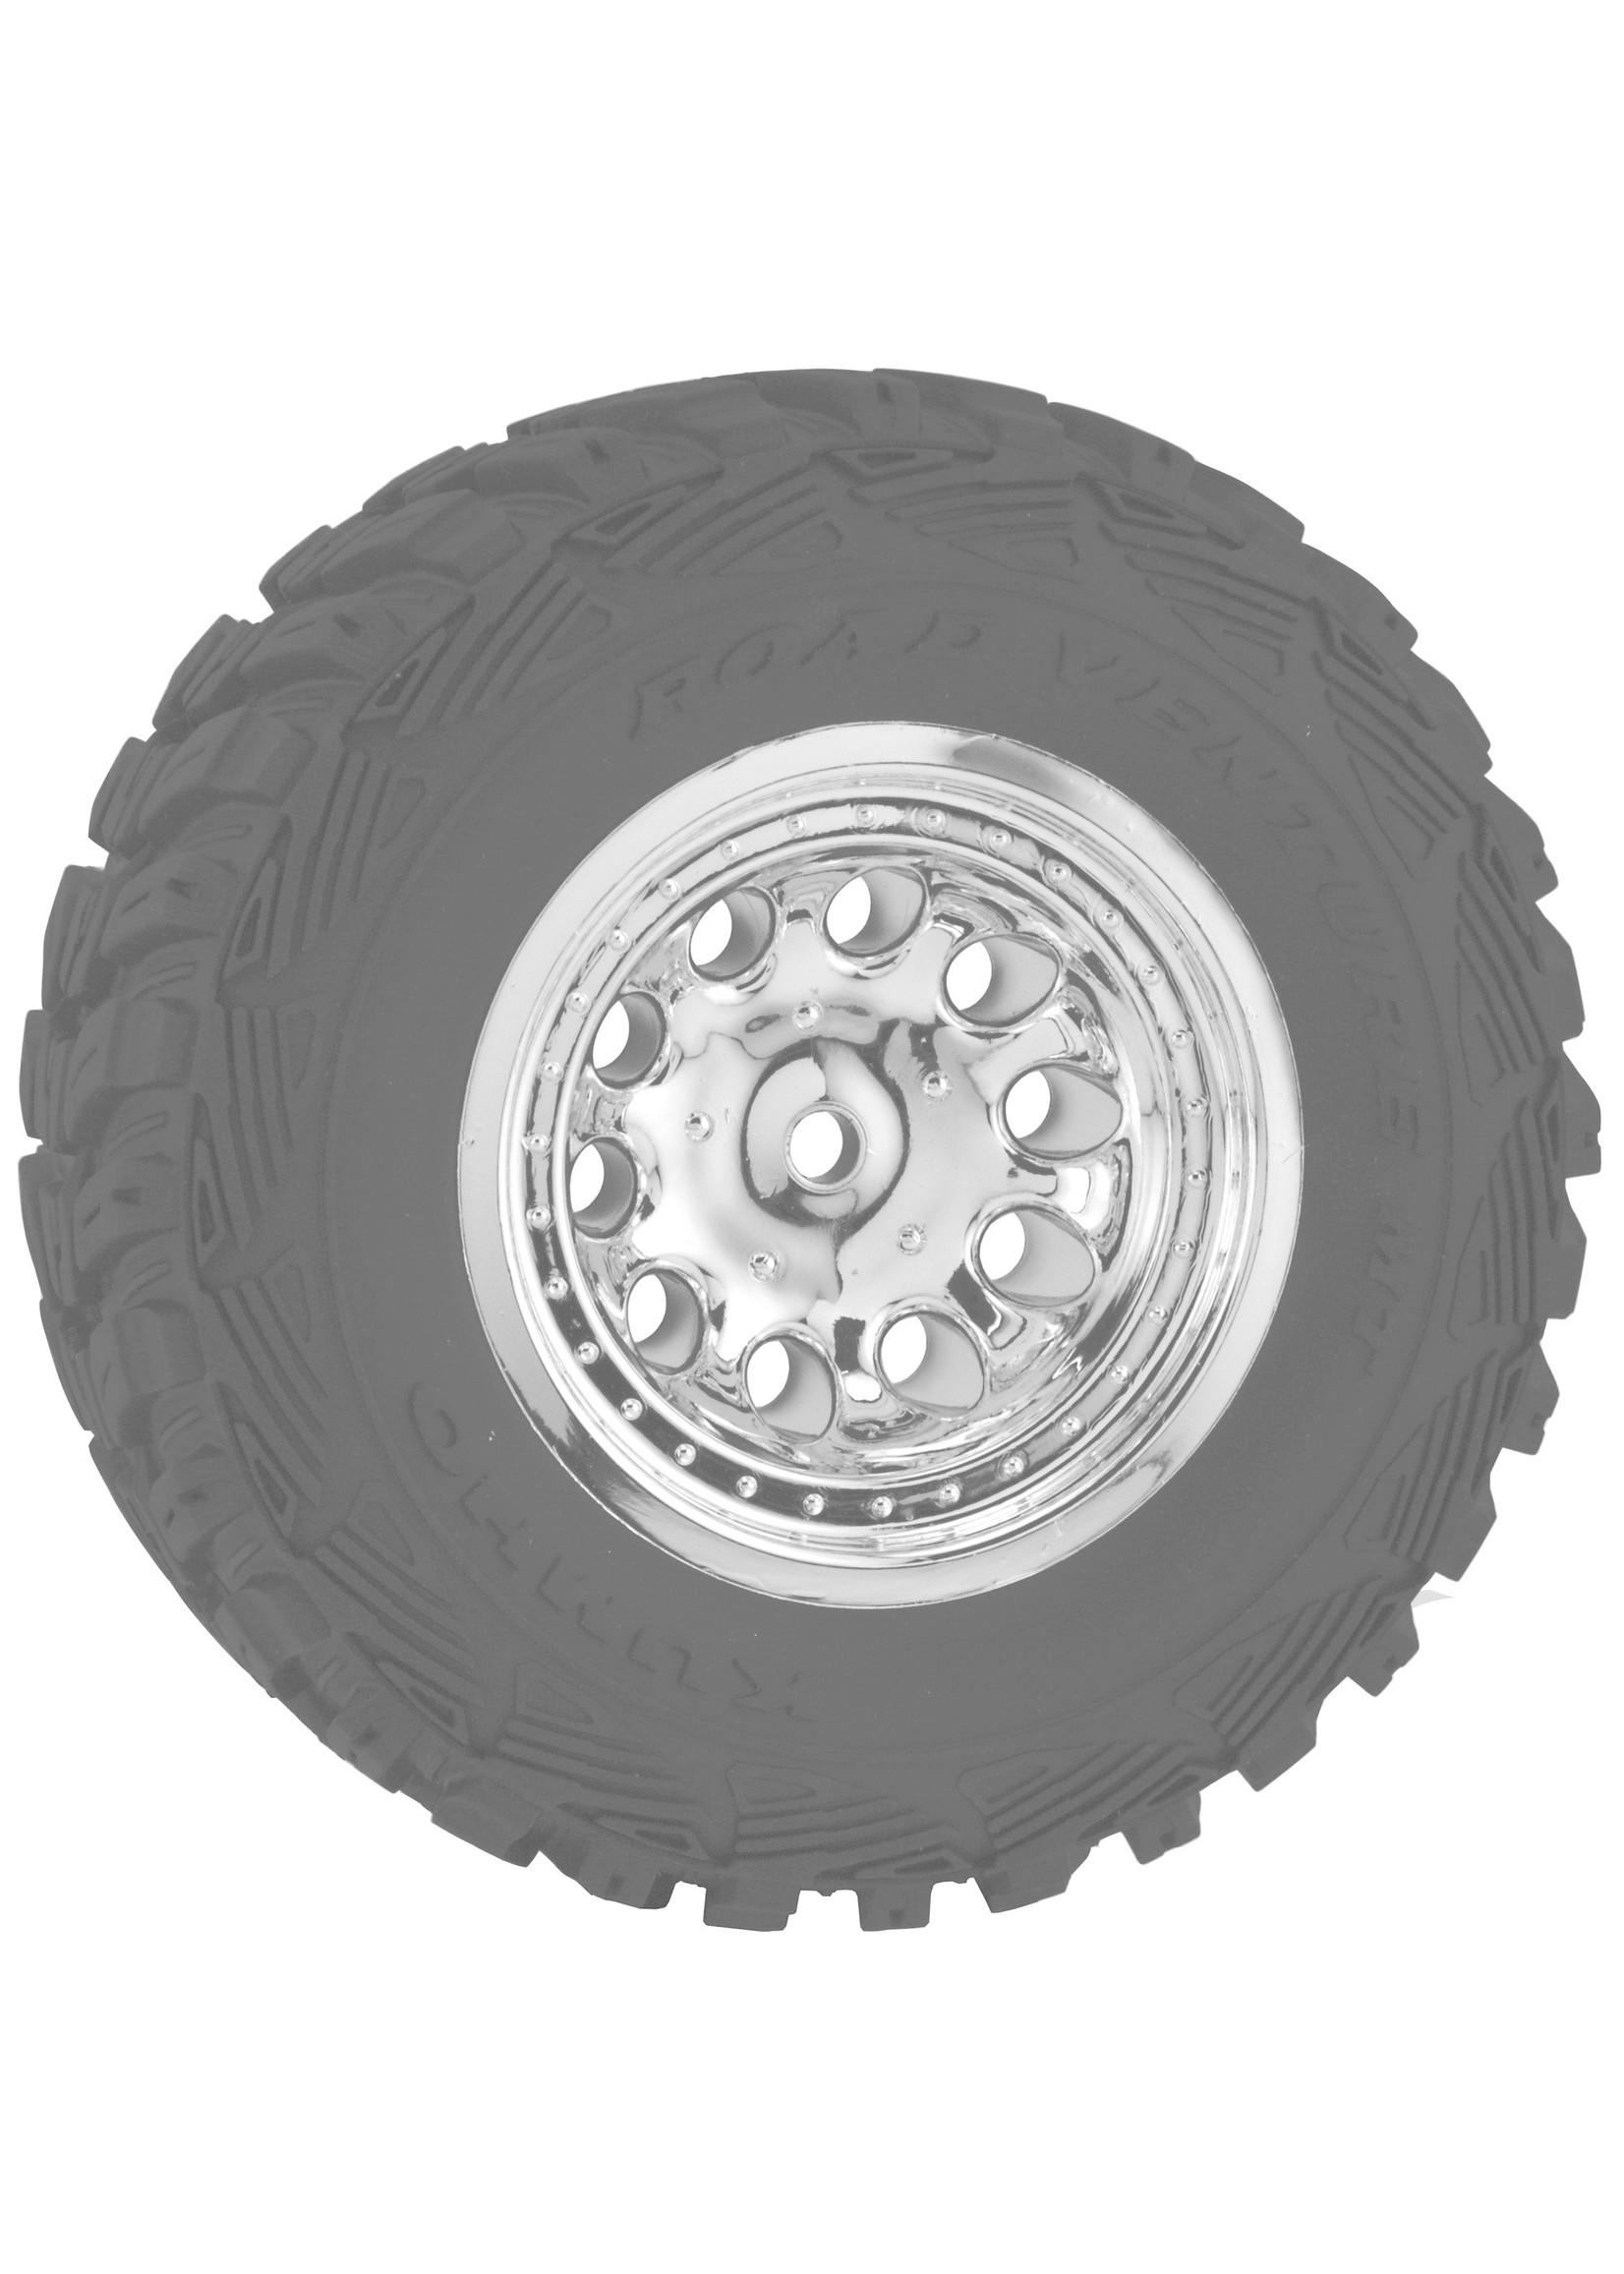 RPM RPM82323 RPM Front Revolver Wheels, Chrome(2): Slash 2WD